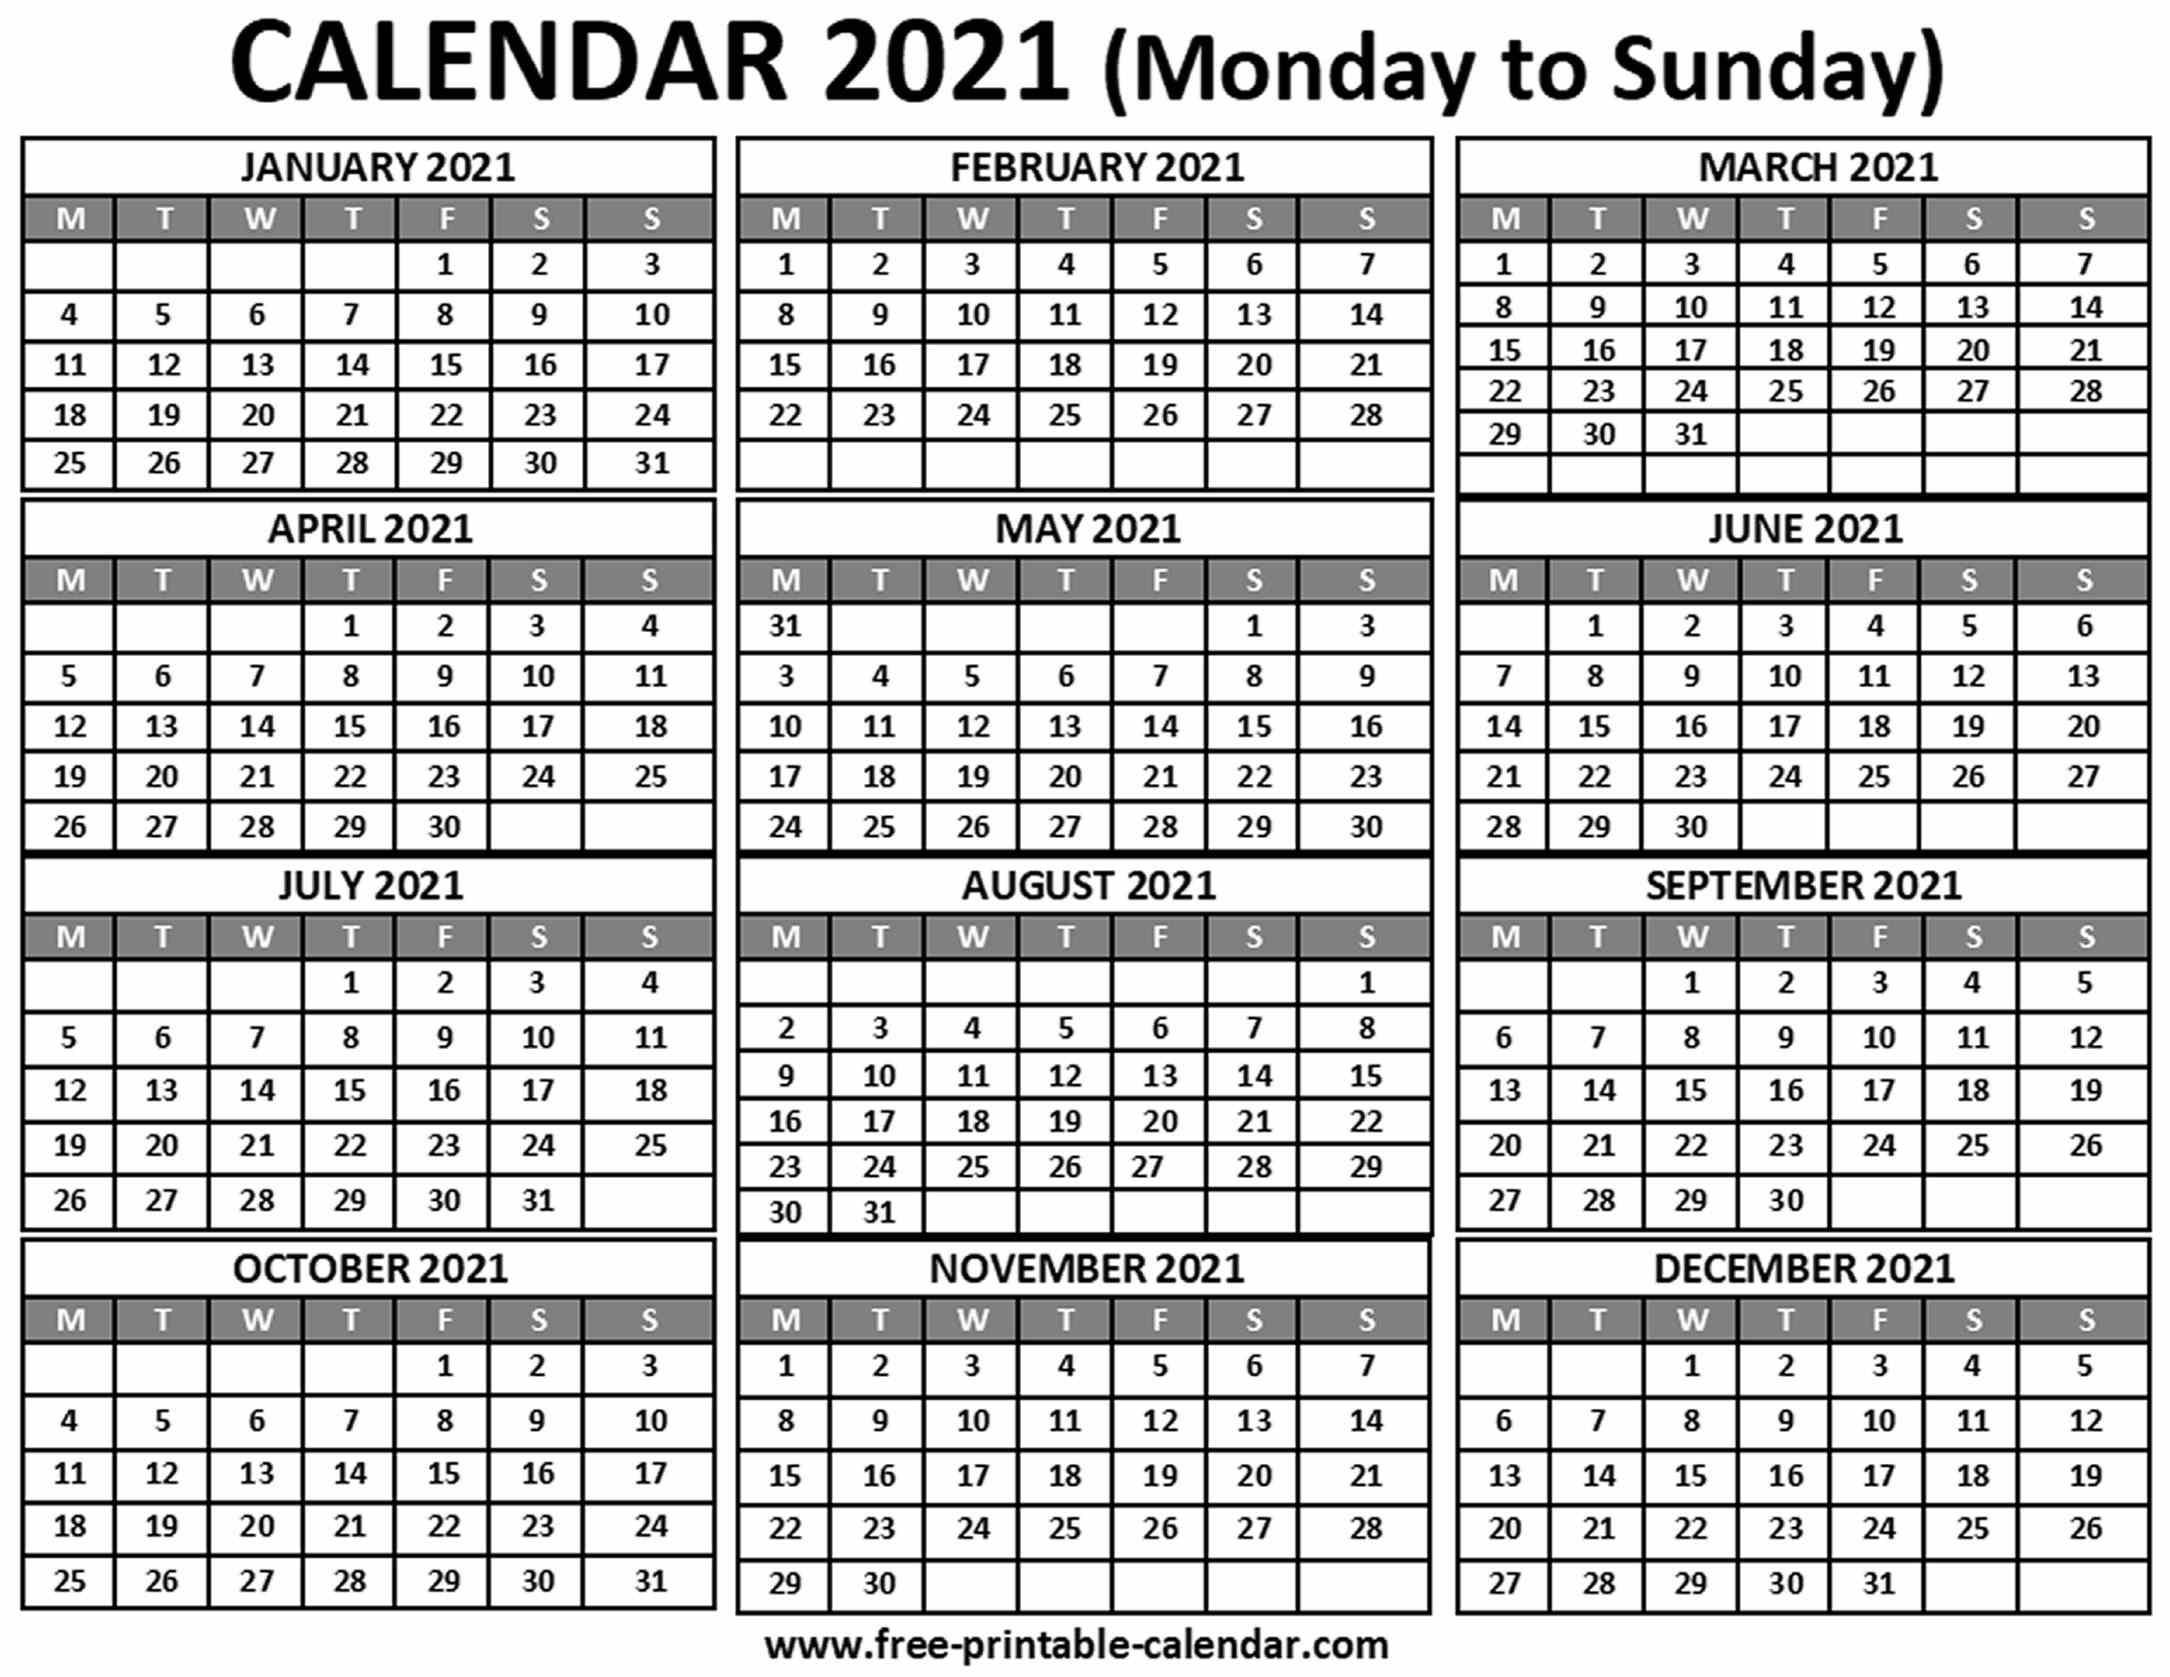 2021 Calendar - Free-Printable-Calendar with regard to 2021 Pocket Calendar Template